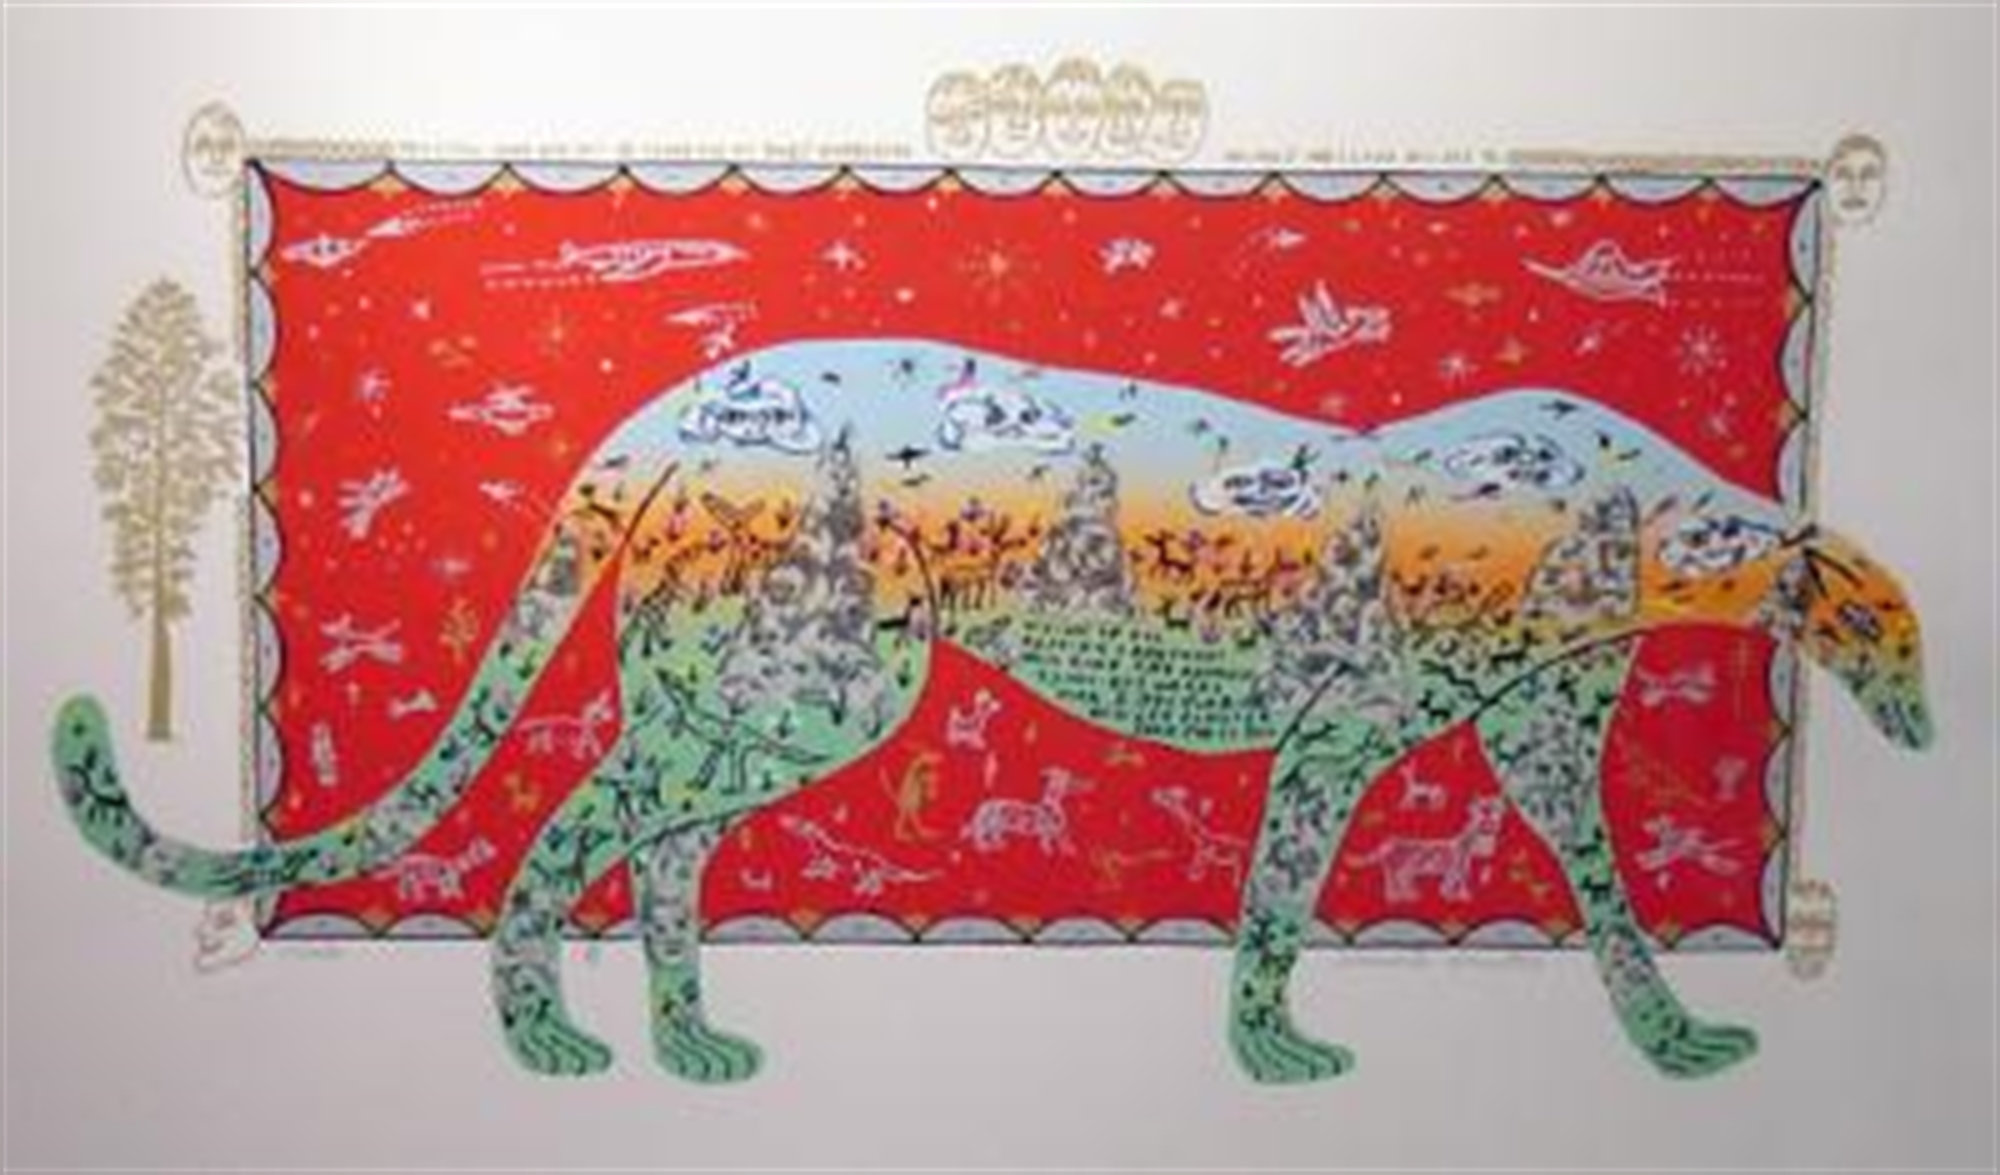 Cheetah by Howard Finster